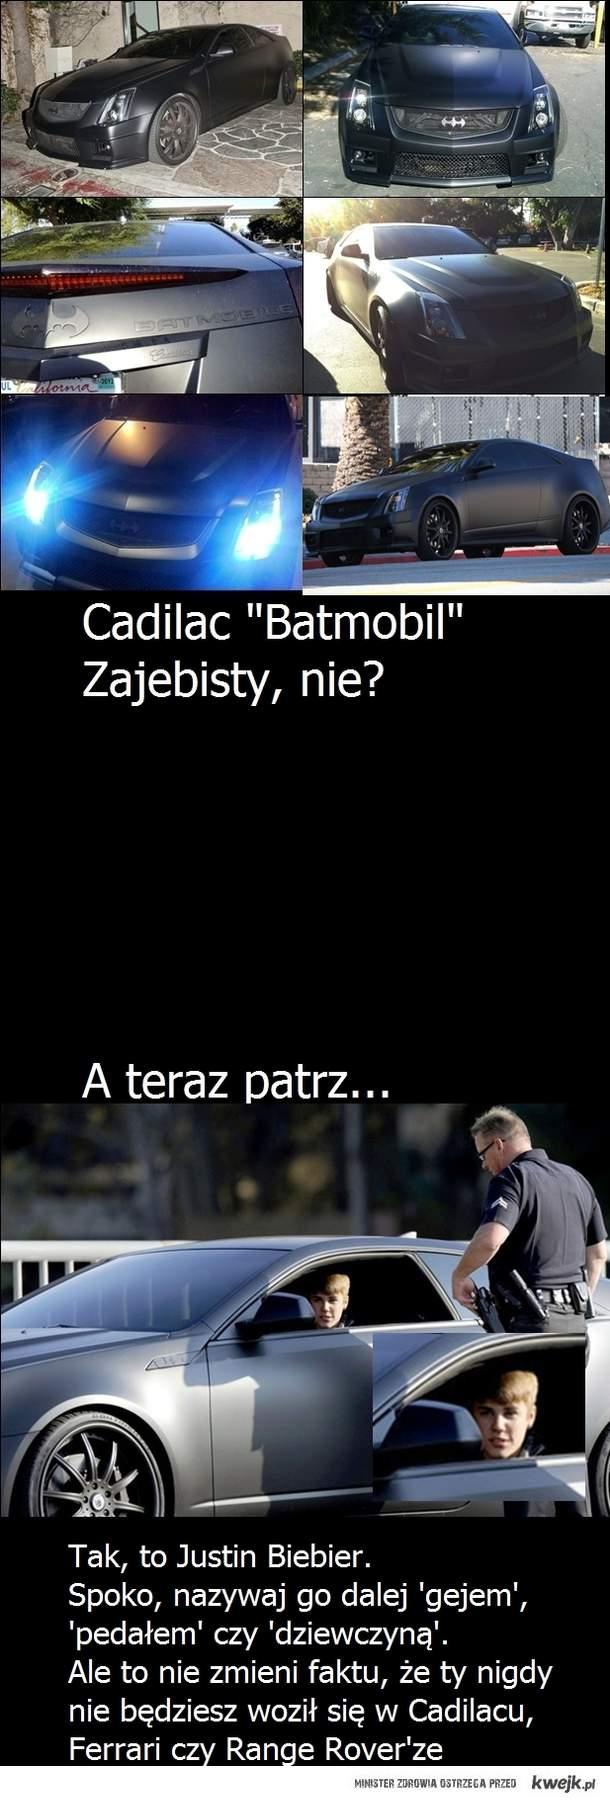 Cadilac Batmobil